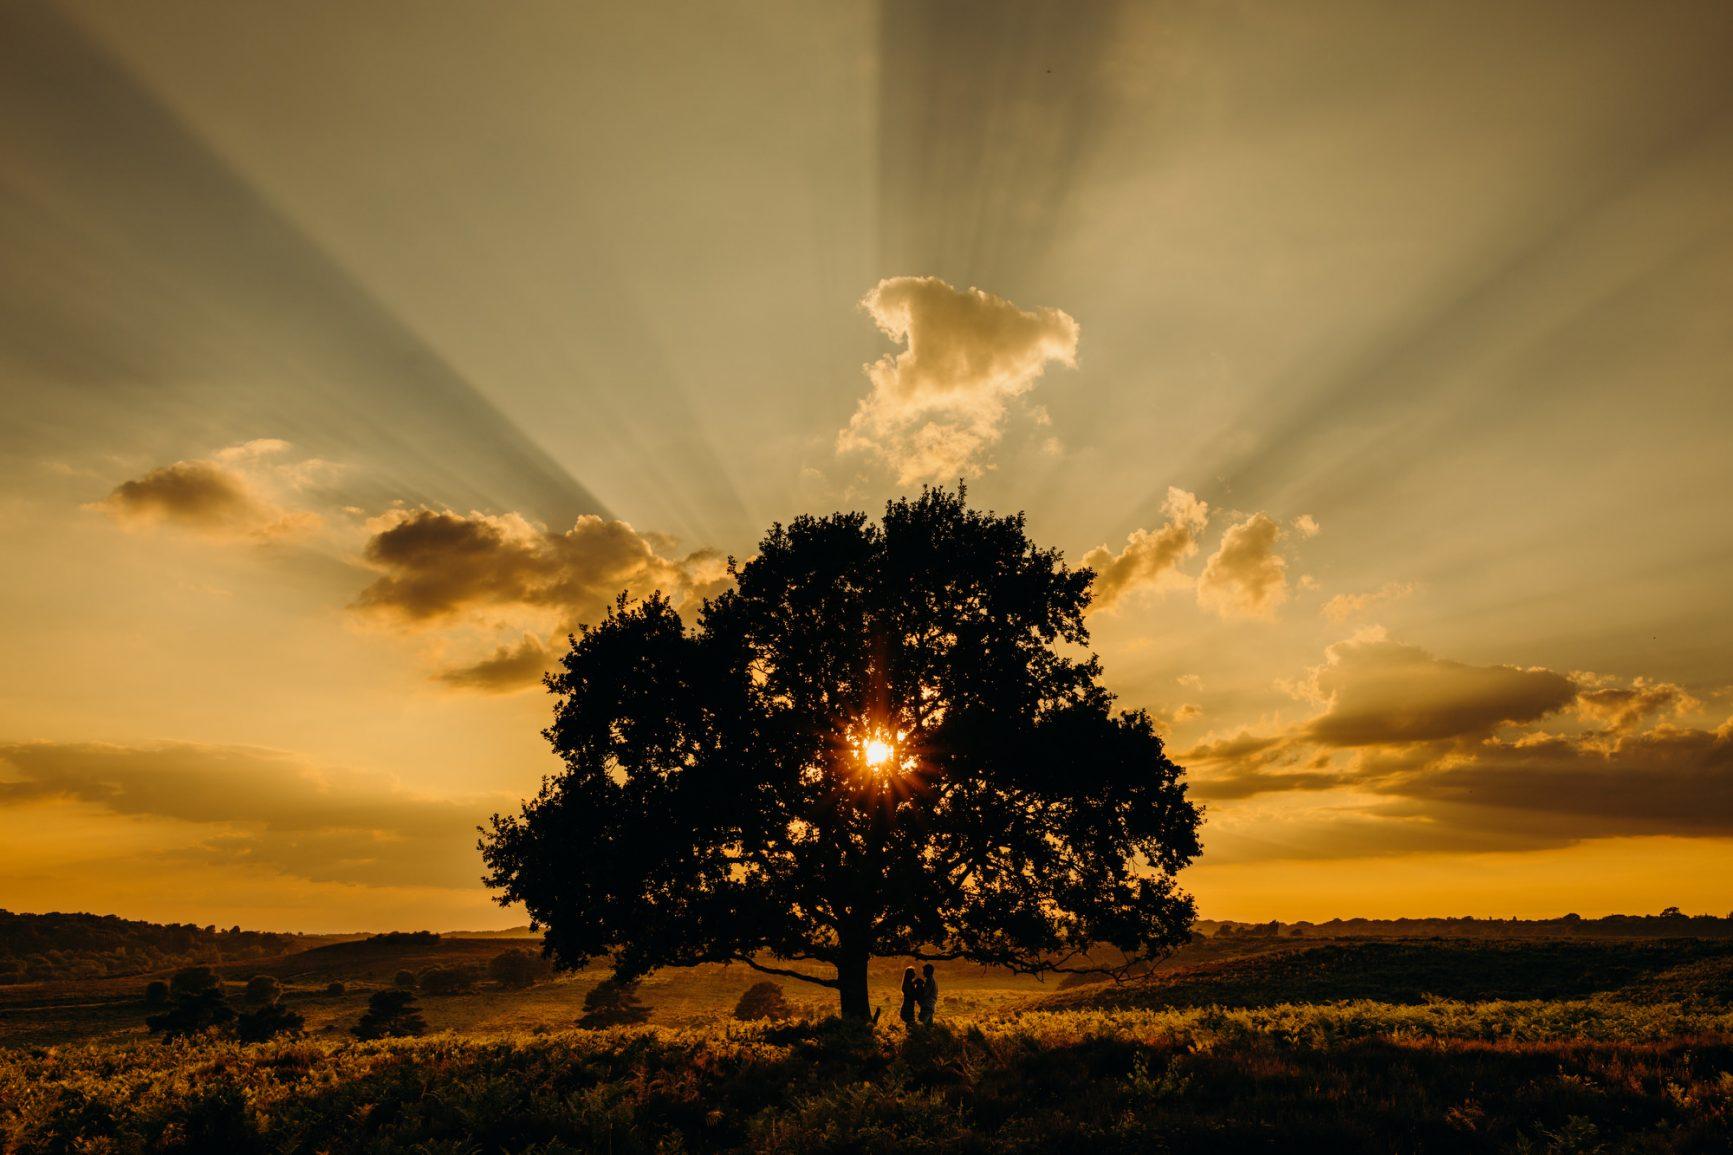 Sunset over an oak tree at Wedding